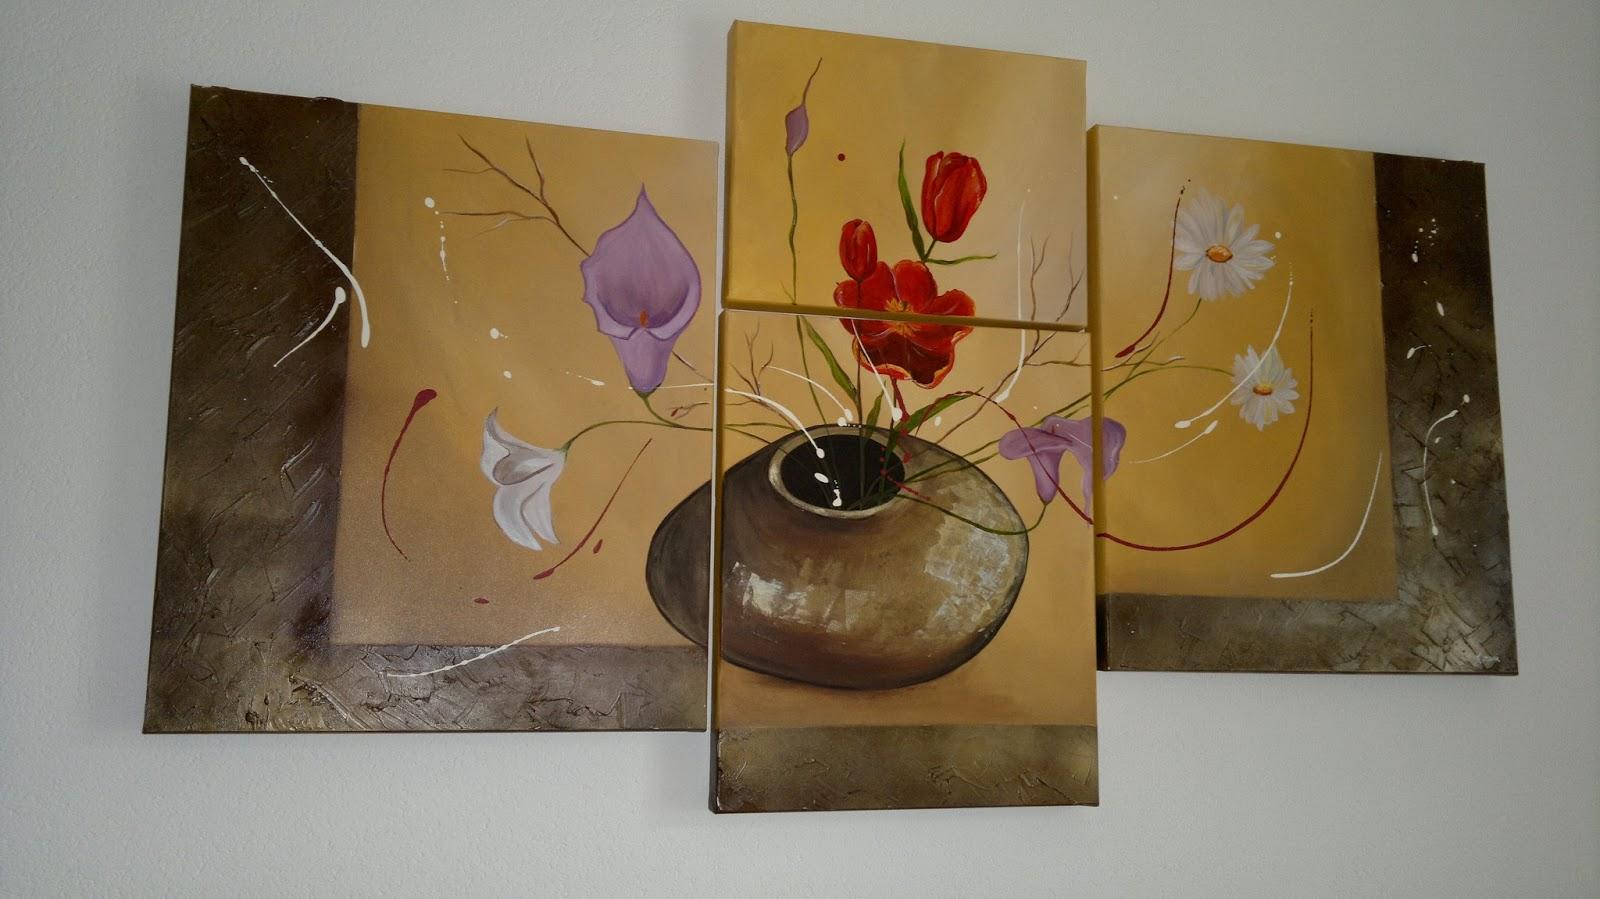 Immagini quadri moderni fiori for Amazon quadri